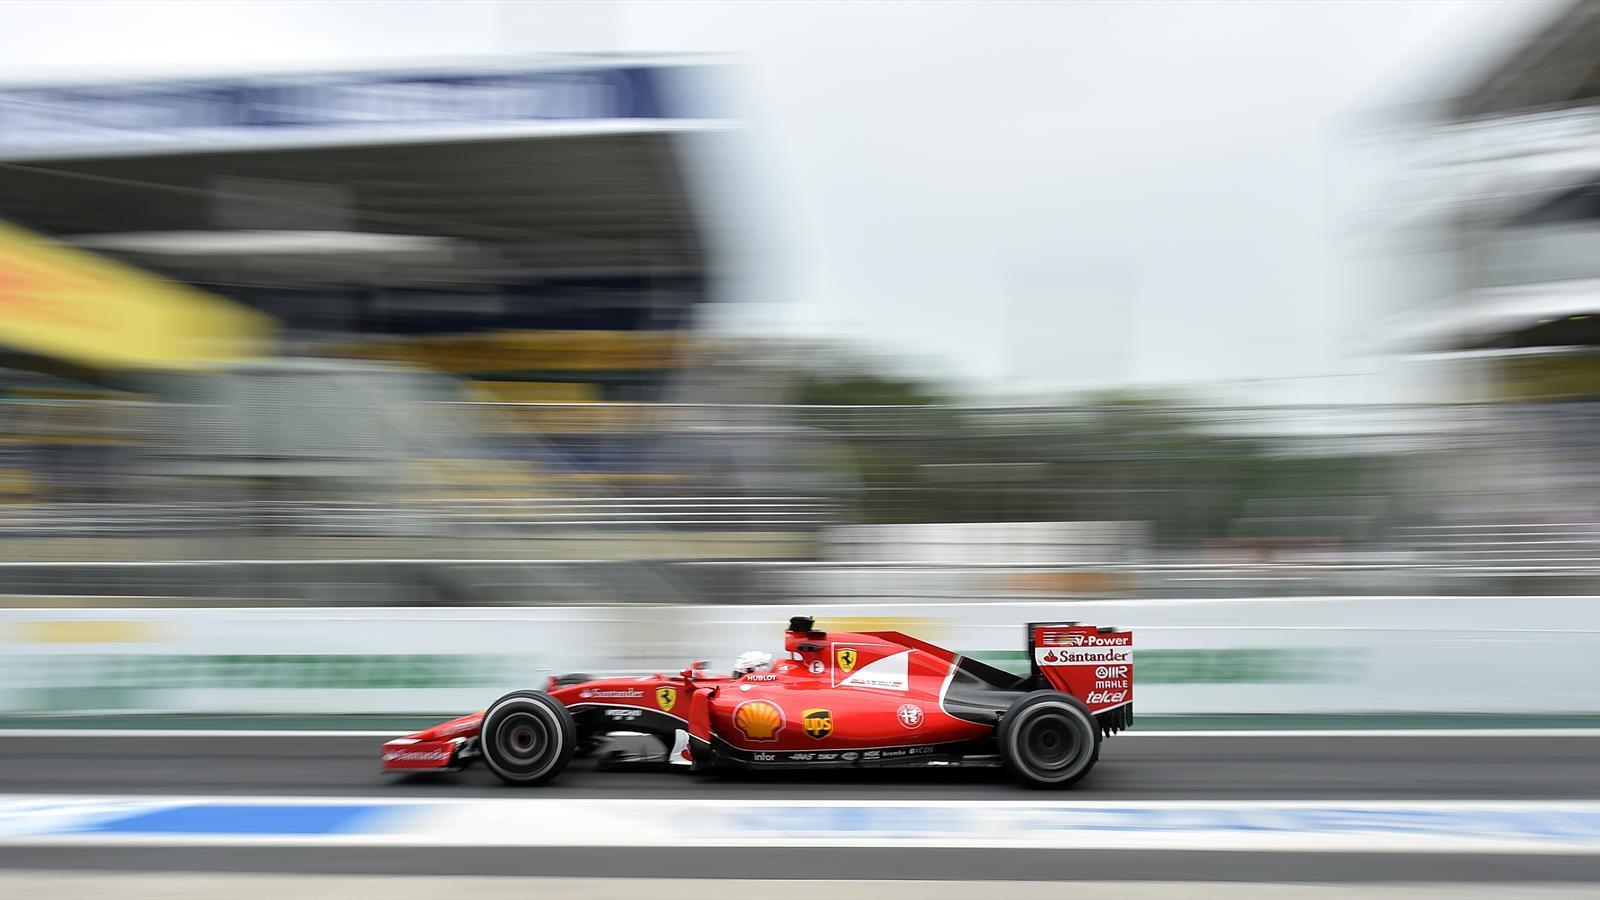 Ferrari's German driver Sebastian Vettel power his car at the Interlagos racetrack on November 13, 2015 in Sao Paulo, Brazil, ahead of the Brazilian Formula One GP next November 15th